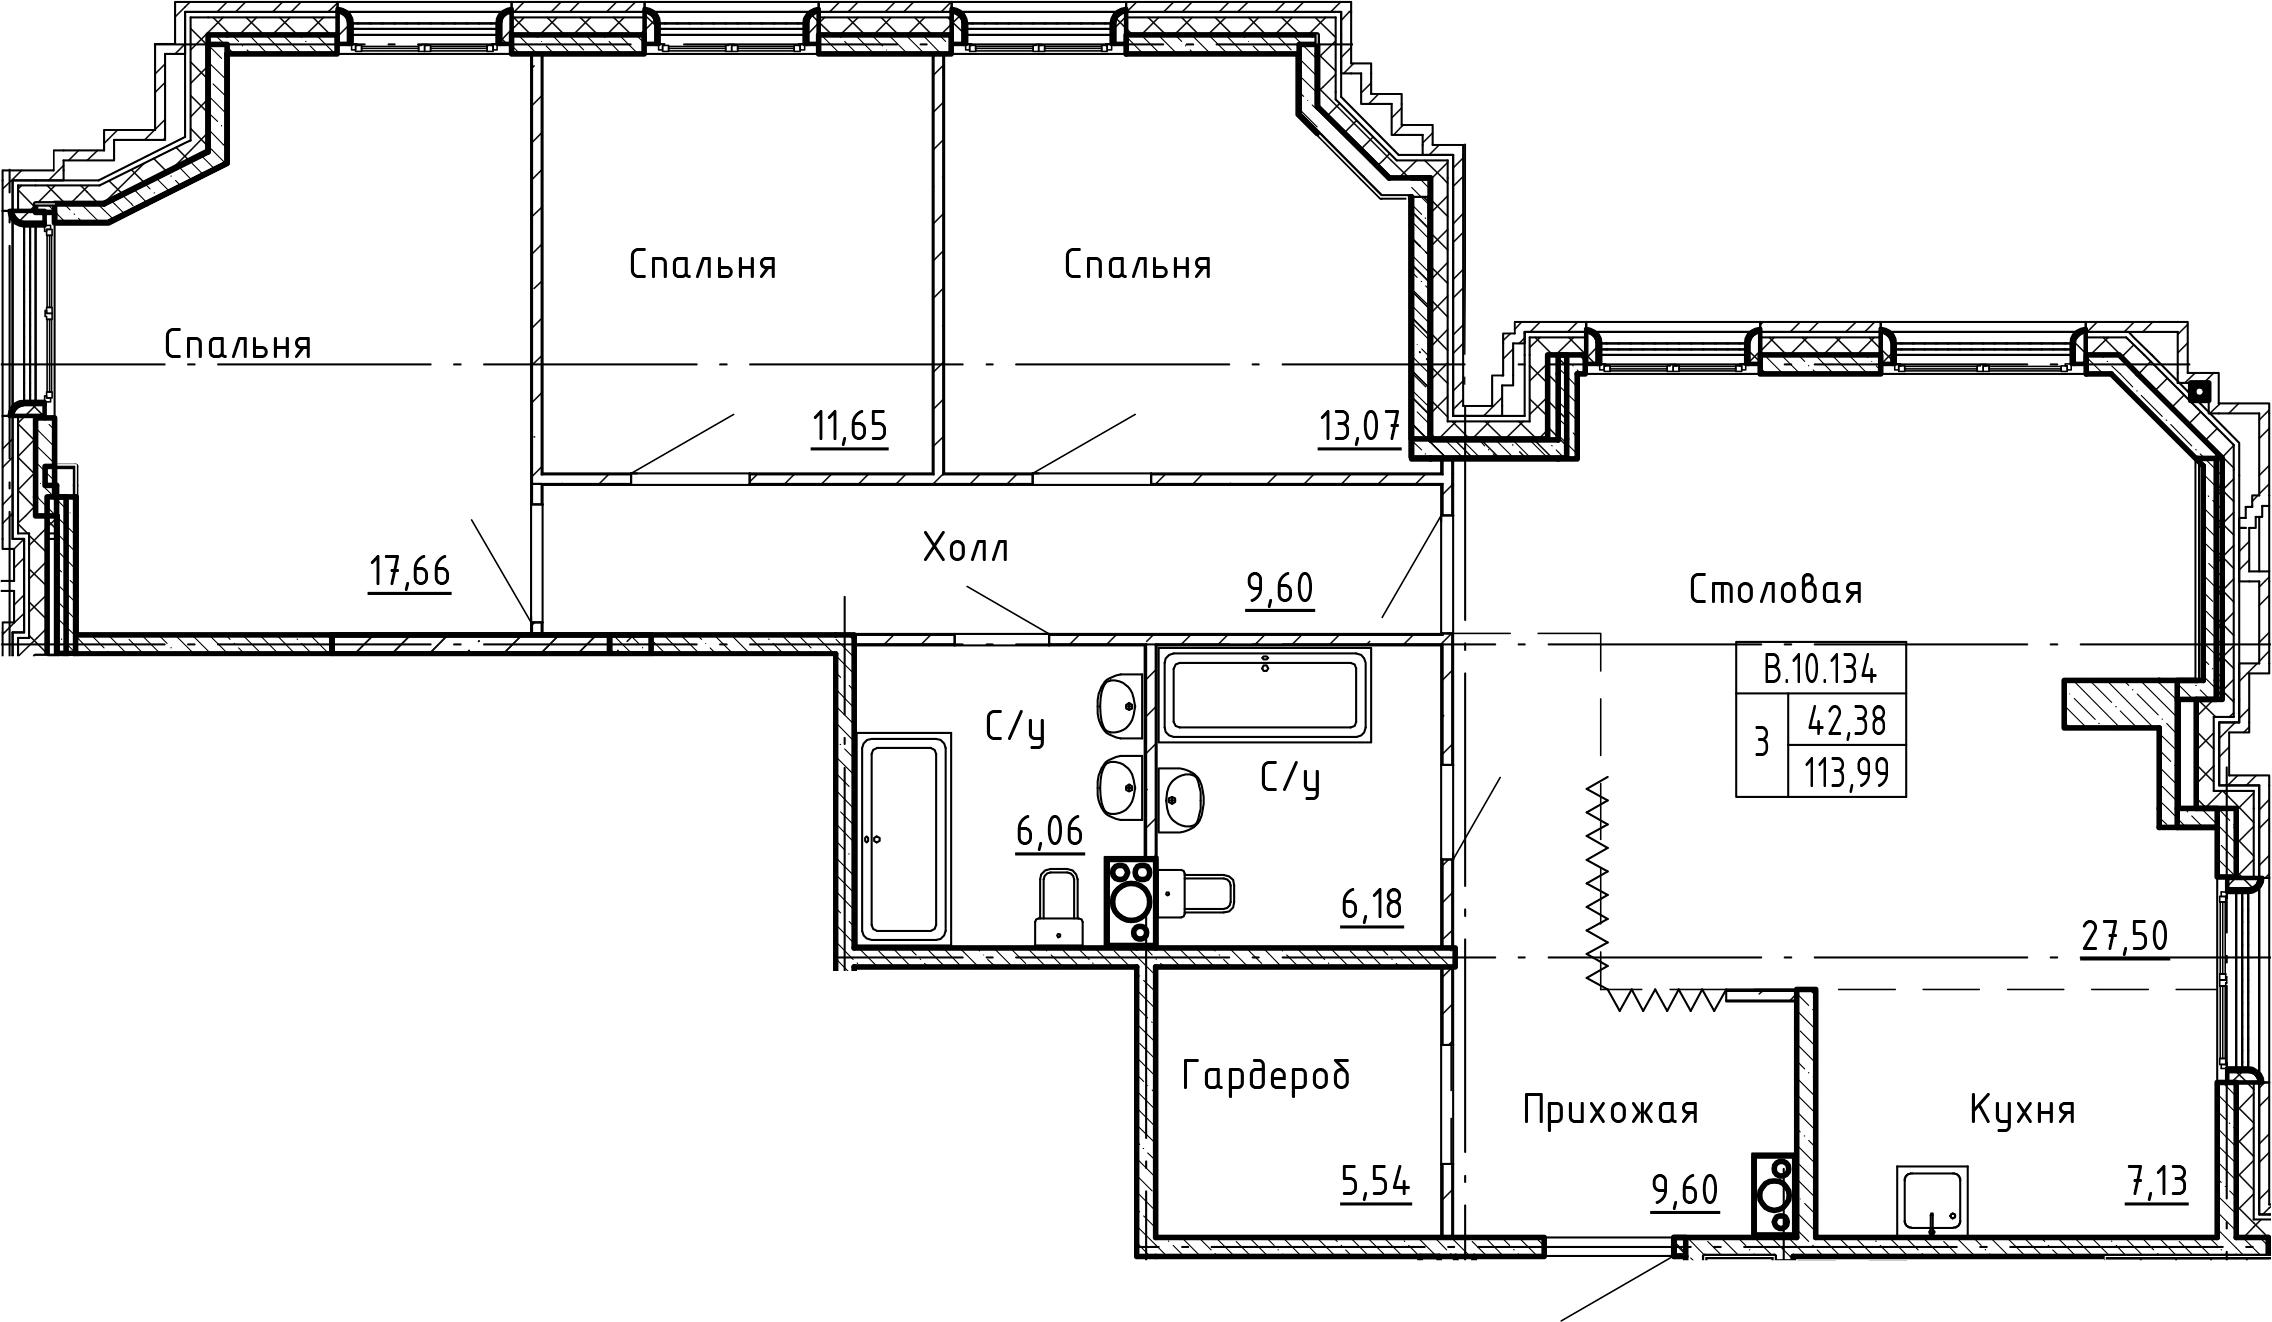 4Е-к.кв, 113.99 м²